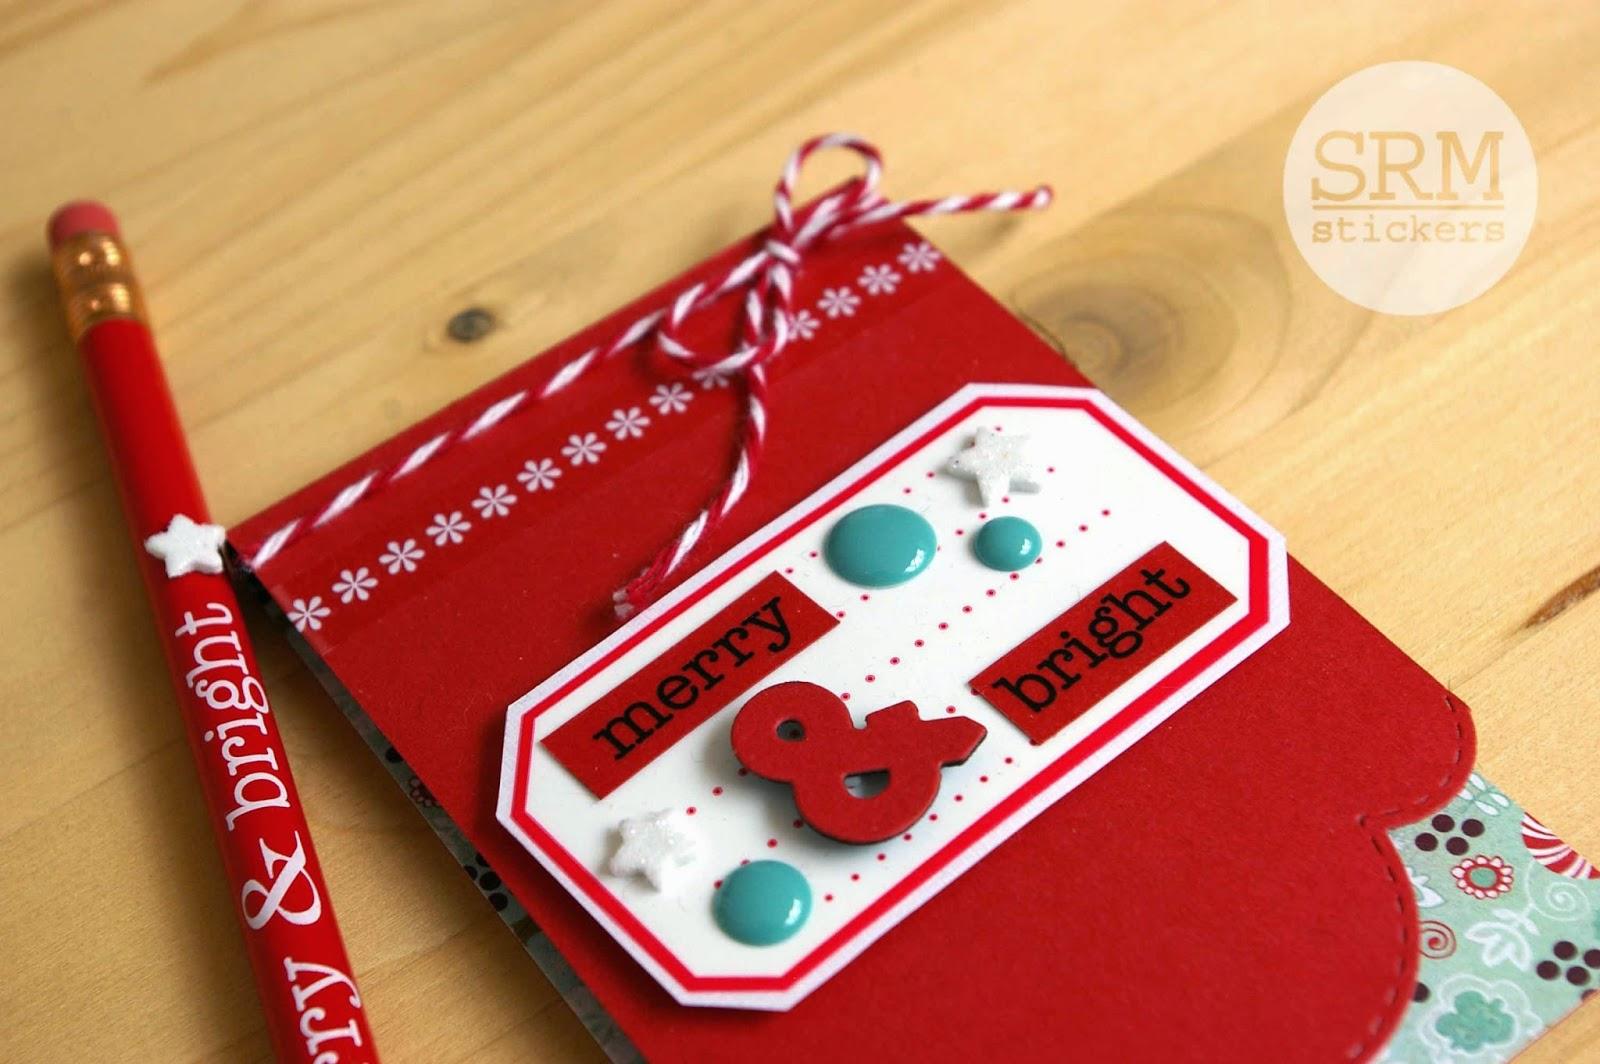 SRM Stickers Blog - Merry & Bright Stocking Stuffer by Lorena - #christmas #pencils #twine #stickers #stockingstuffer #gift